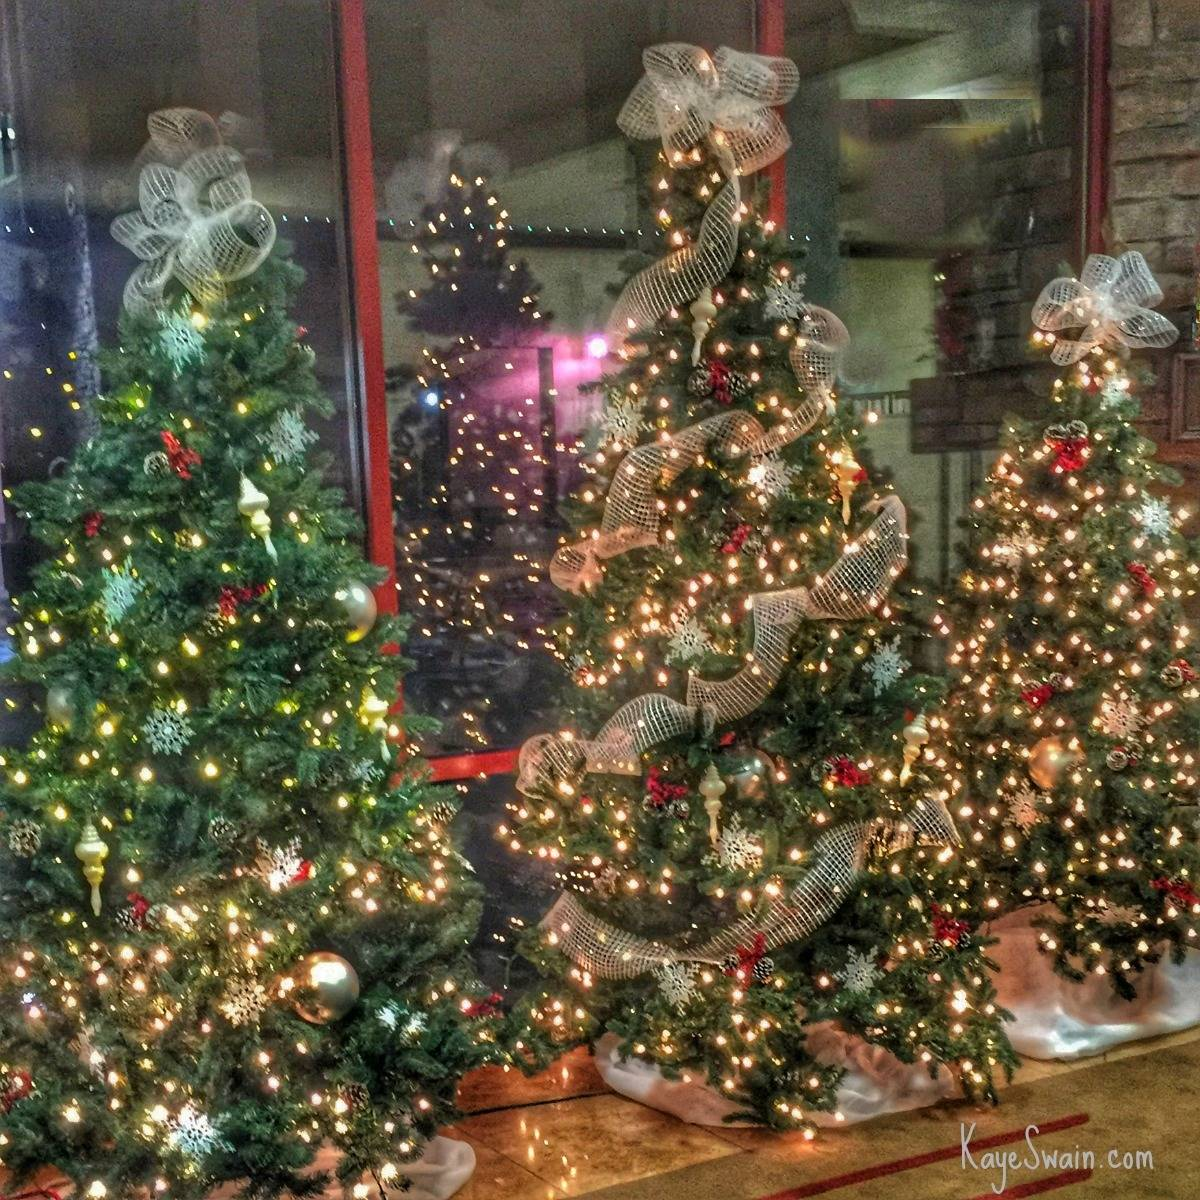 Kaye Swain Roseville CA and Granite Bay CA real estate agent blogger sharing Bayside Church Christmas trees